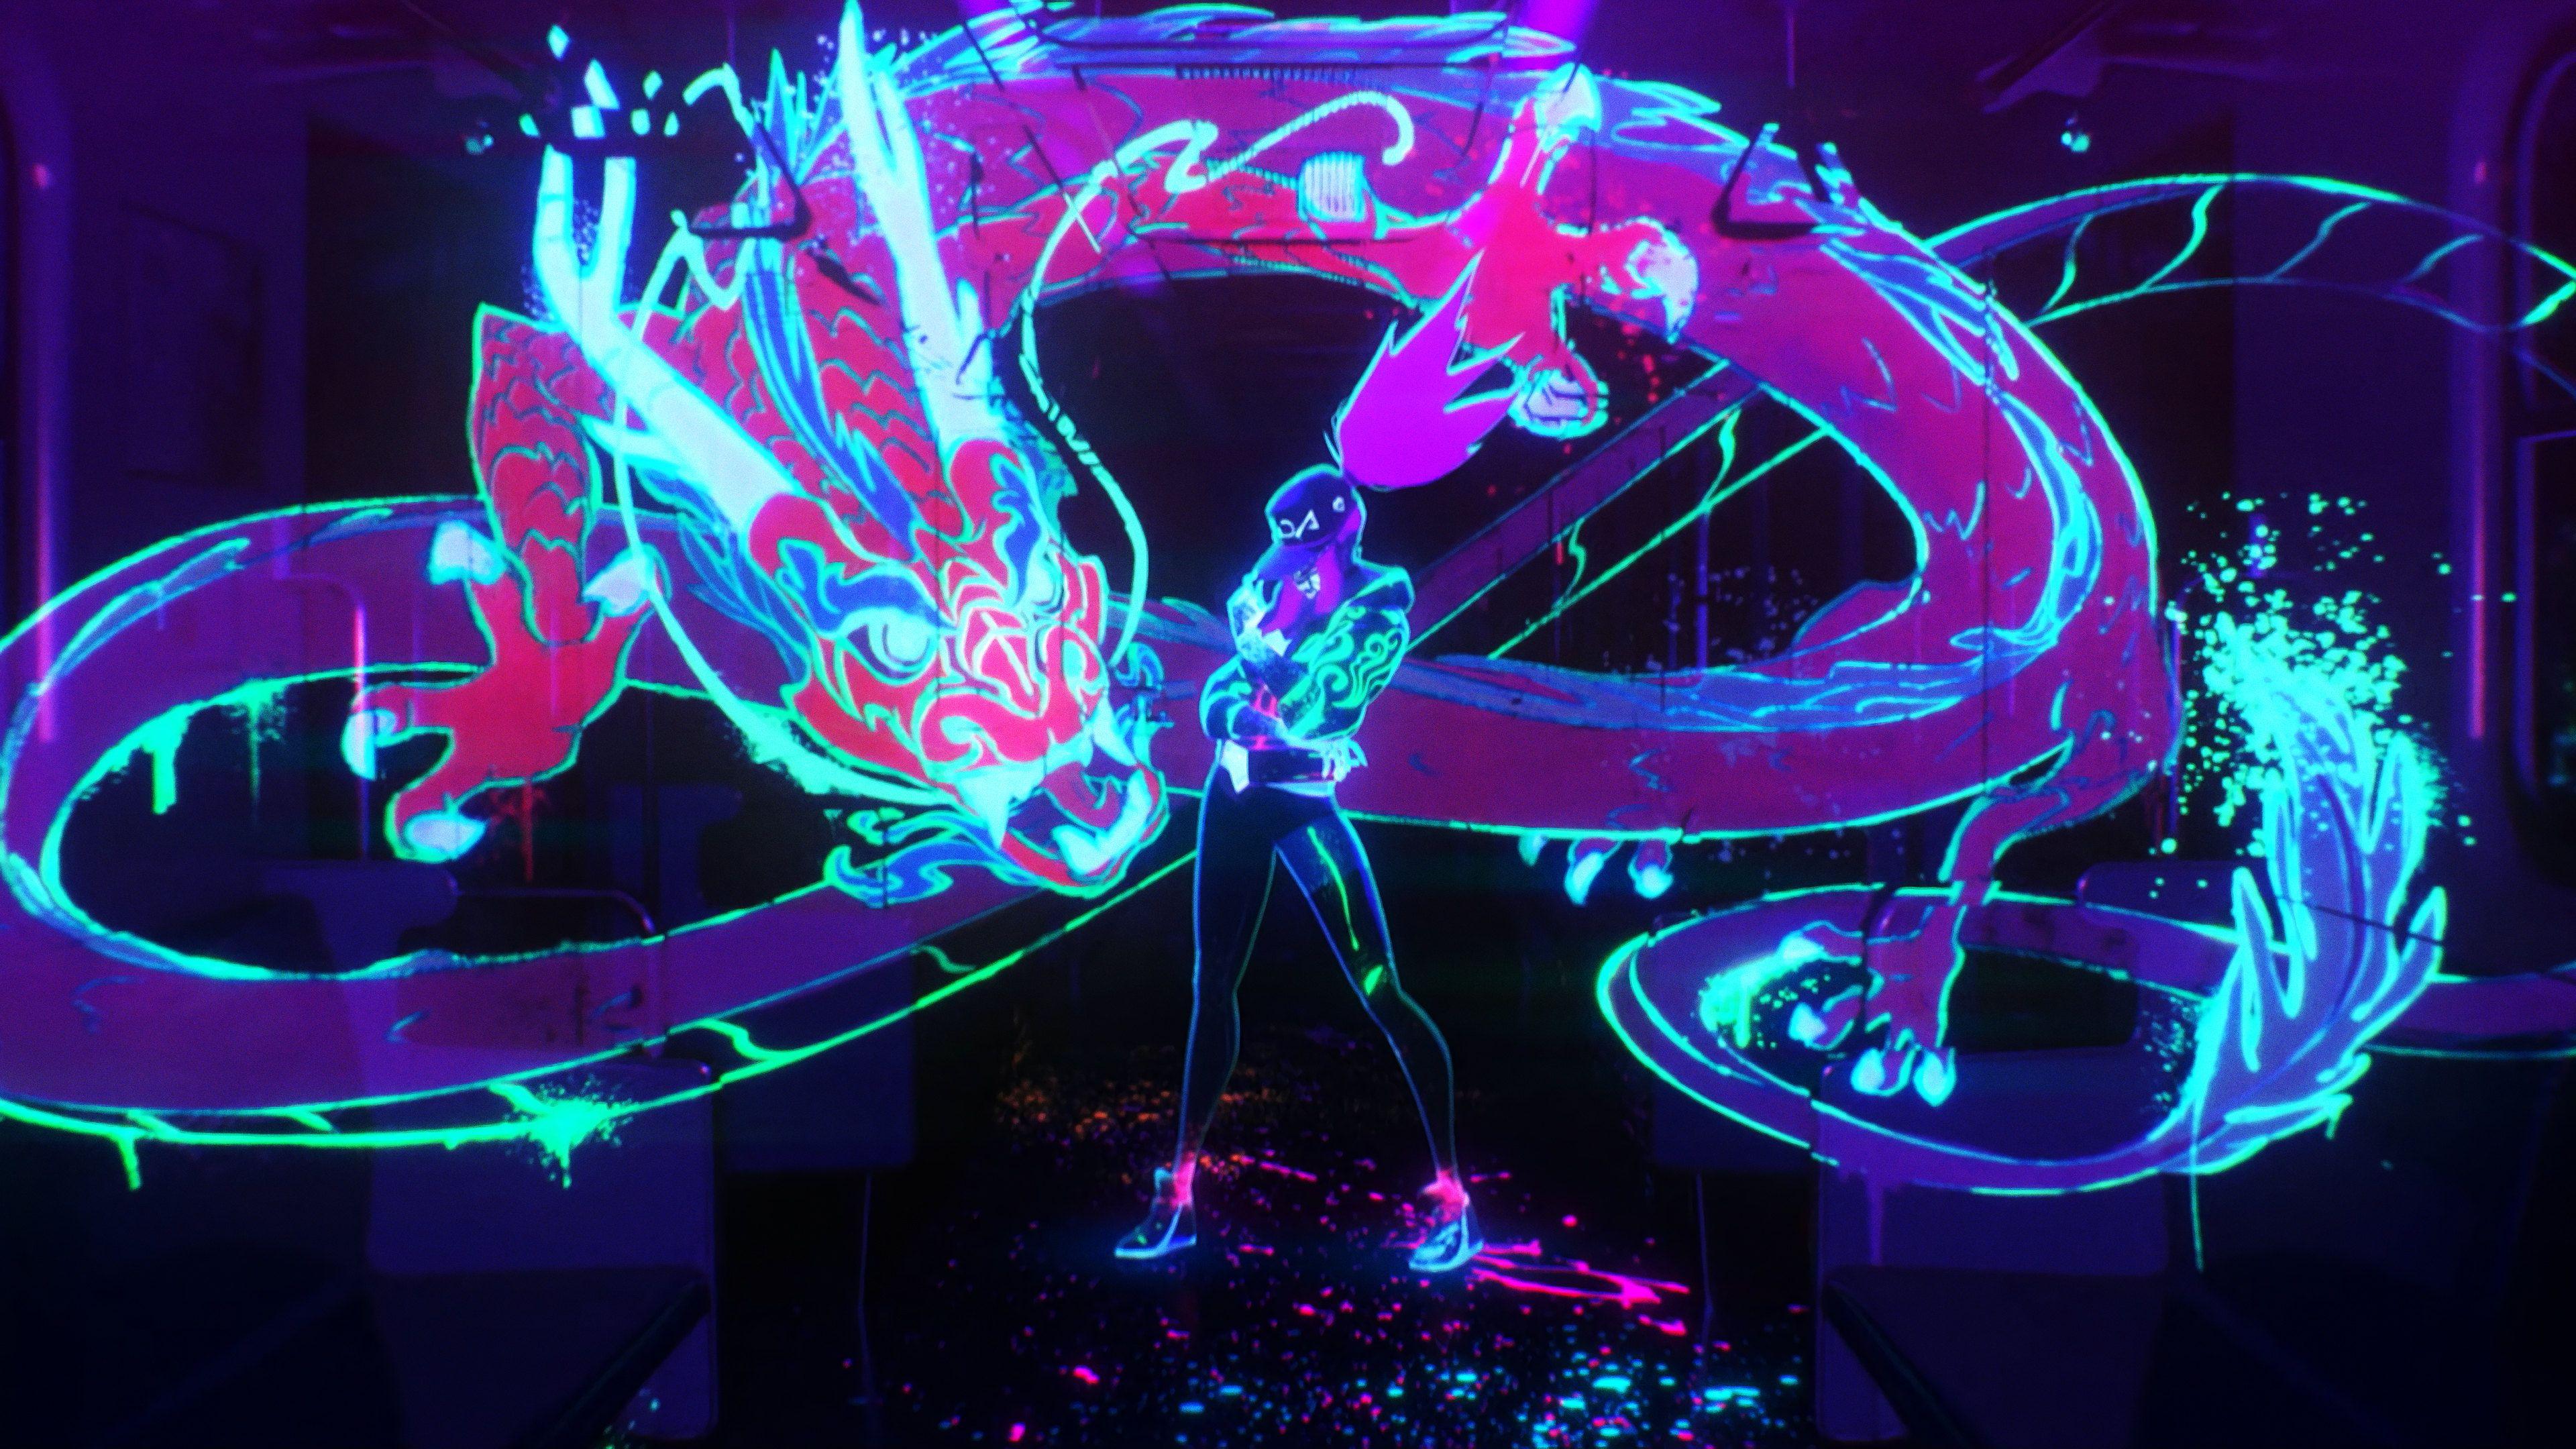 KDA Akali Neon Wallpapers - Wallpaper Cave